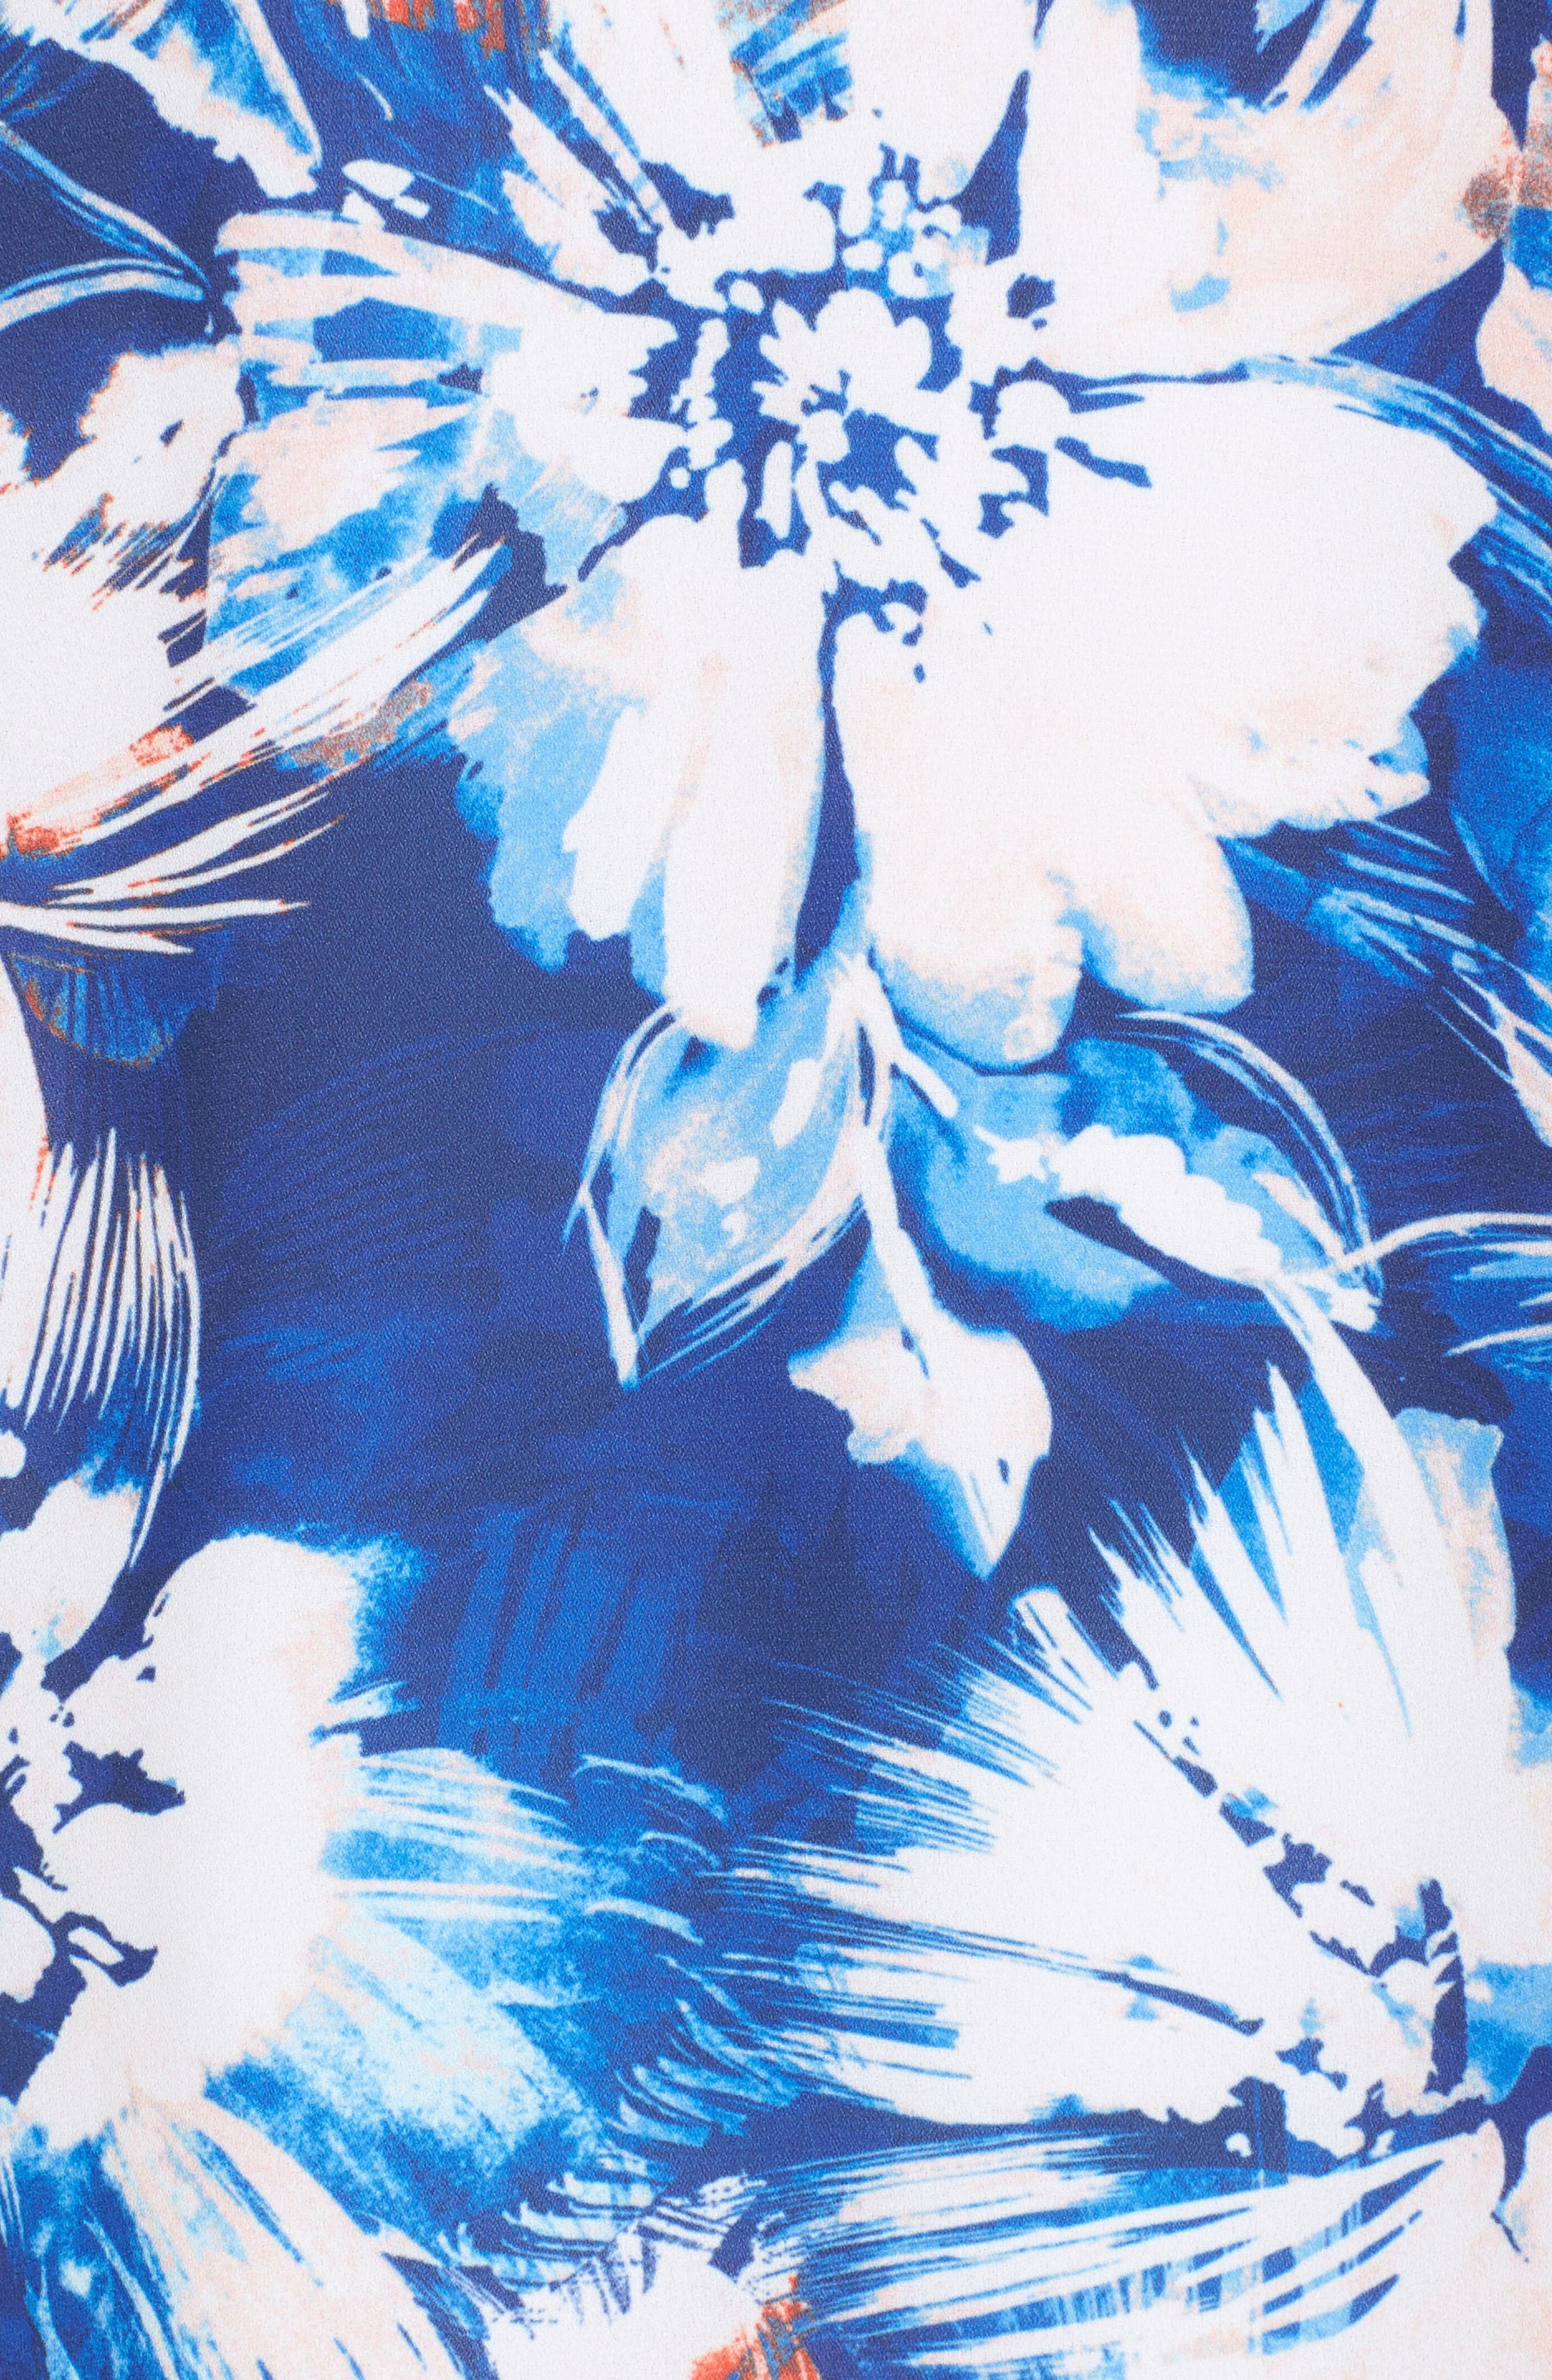 Ruffle Shift Dress,                             Alternate thumbnail 5, color,                             432